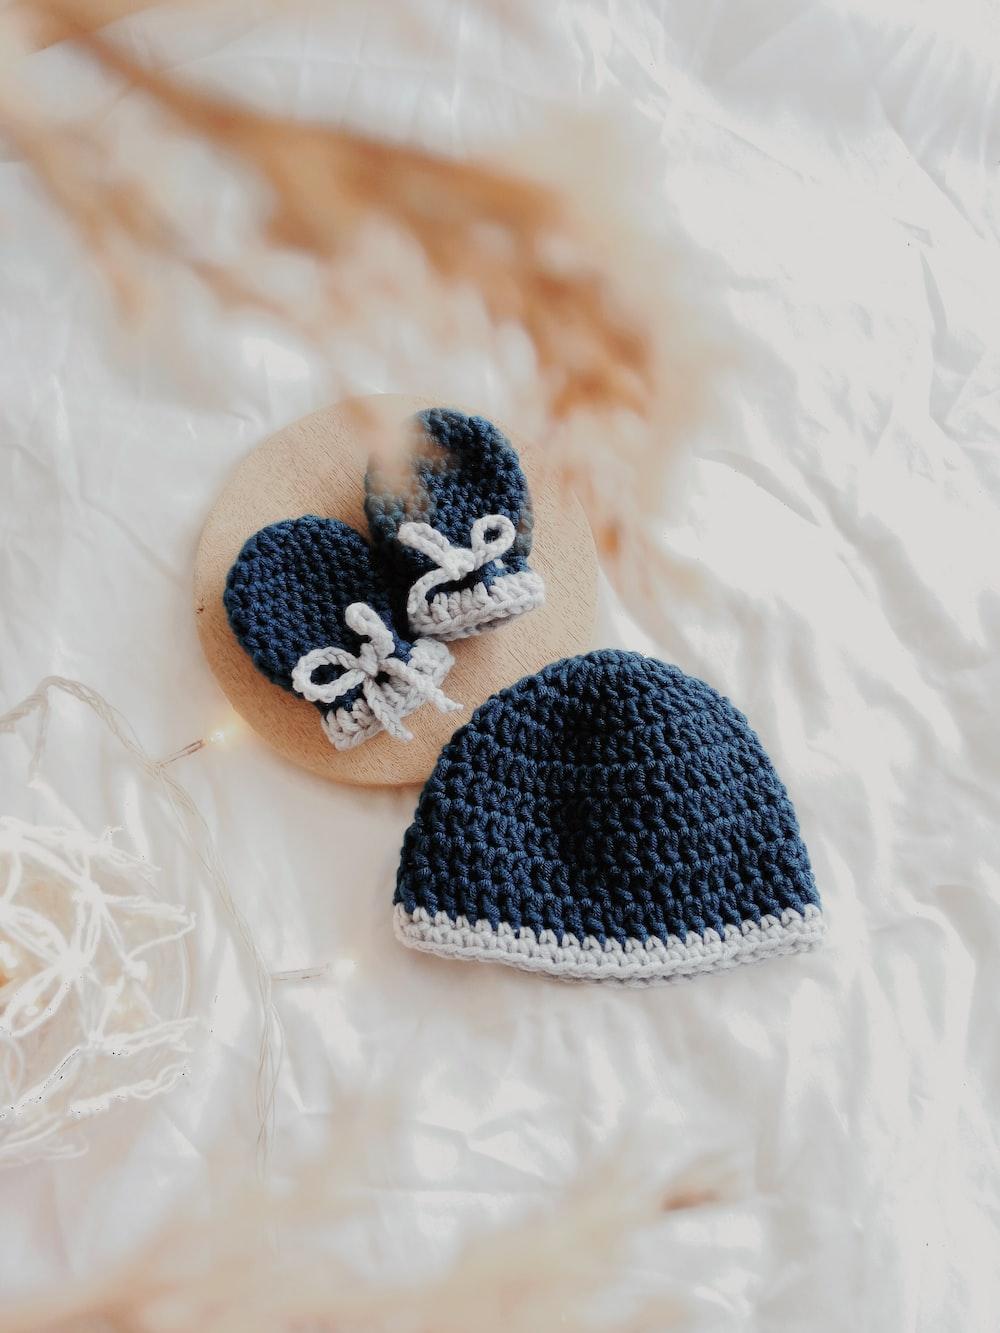 babys black knit cap and gloves